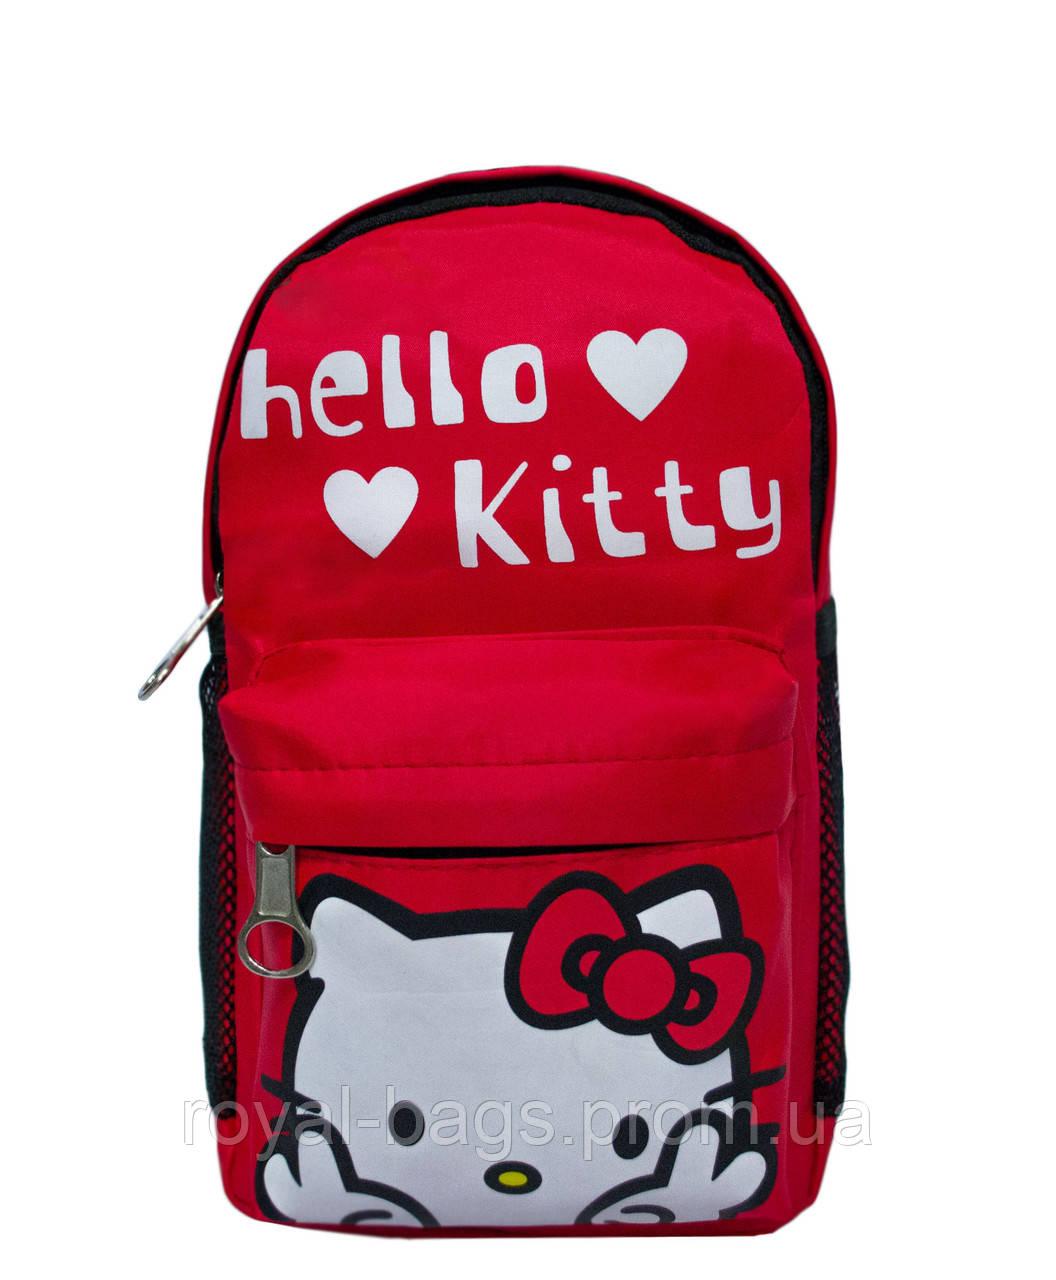 "Рюкзачок ""Мультяшки"" Hello Kitty 2 Цвета Красный."